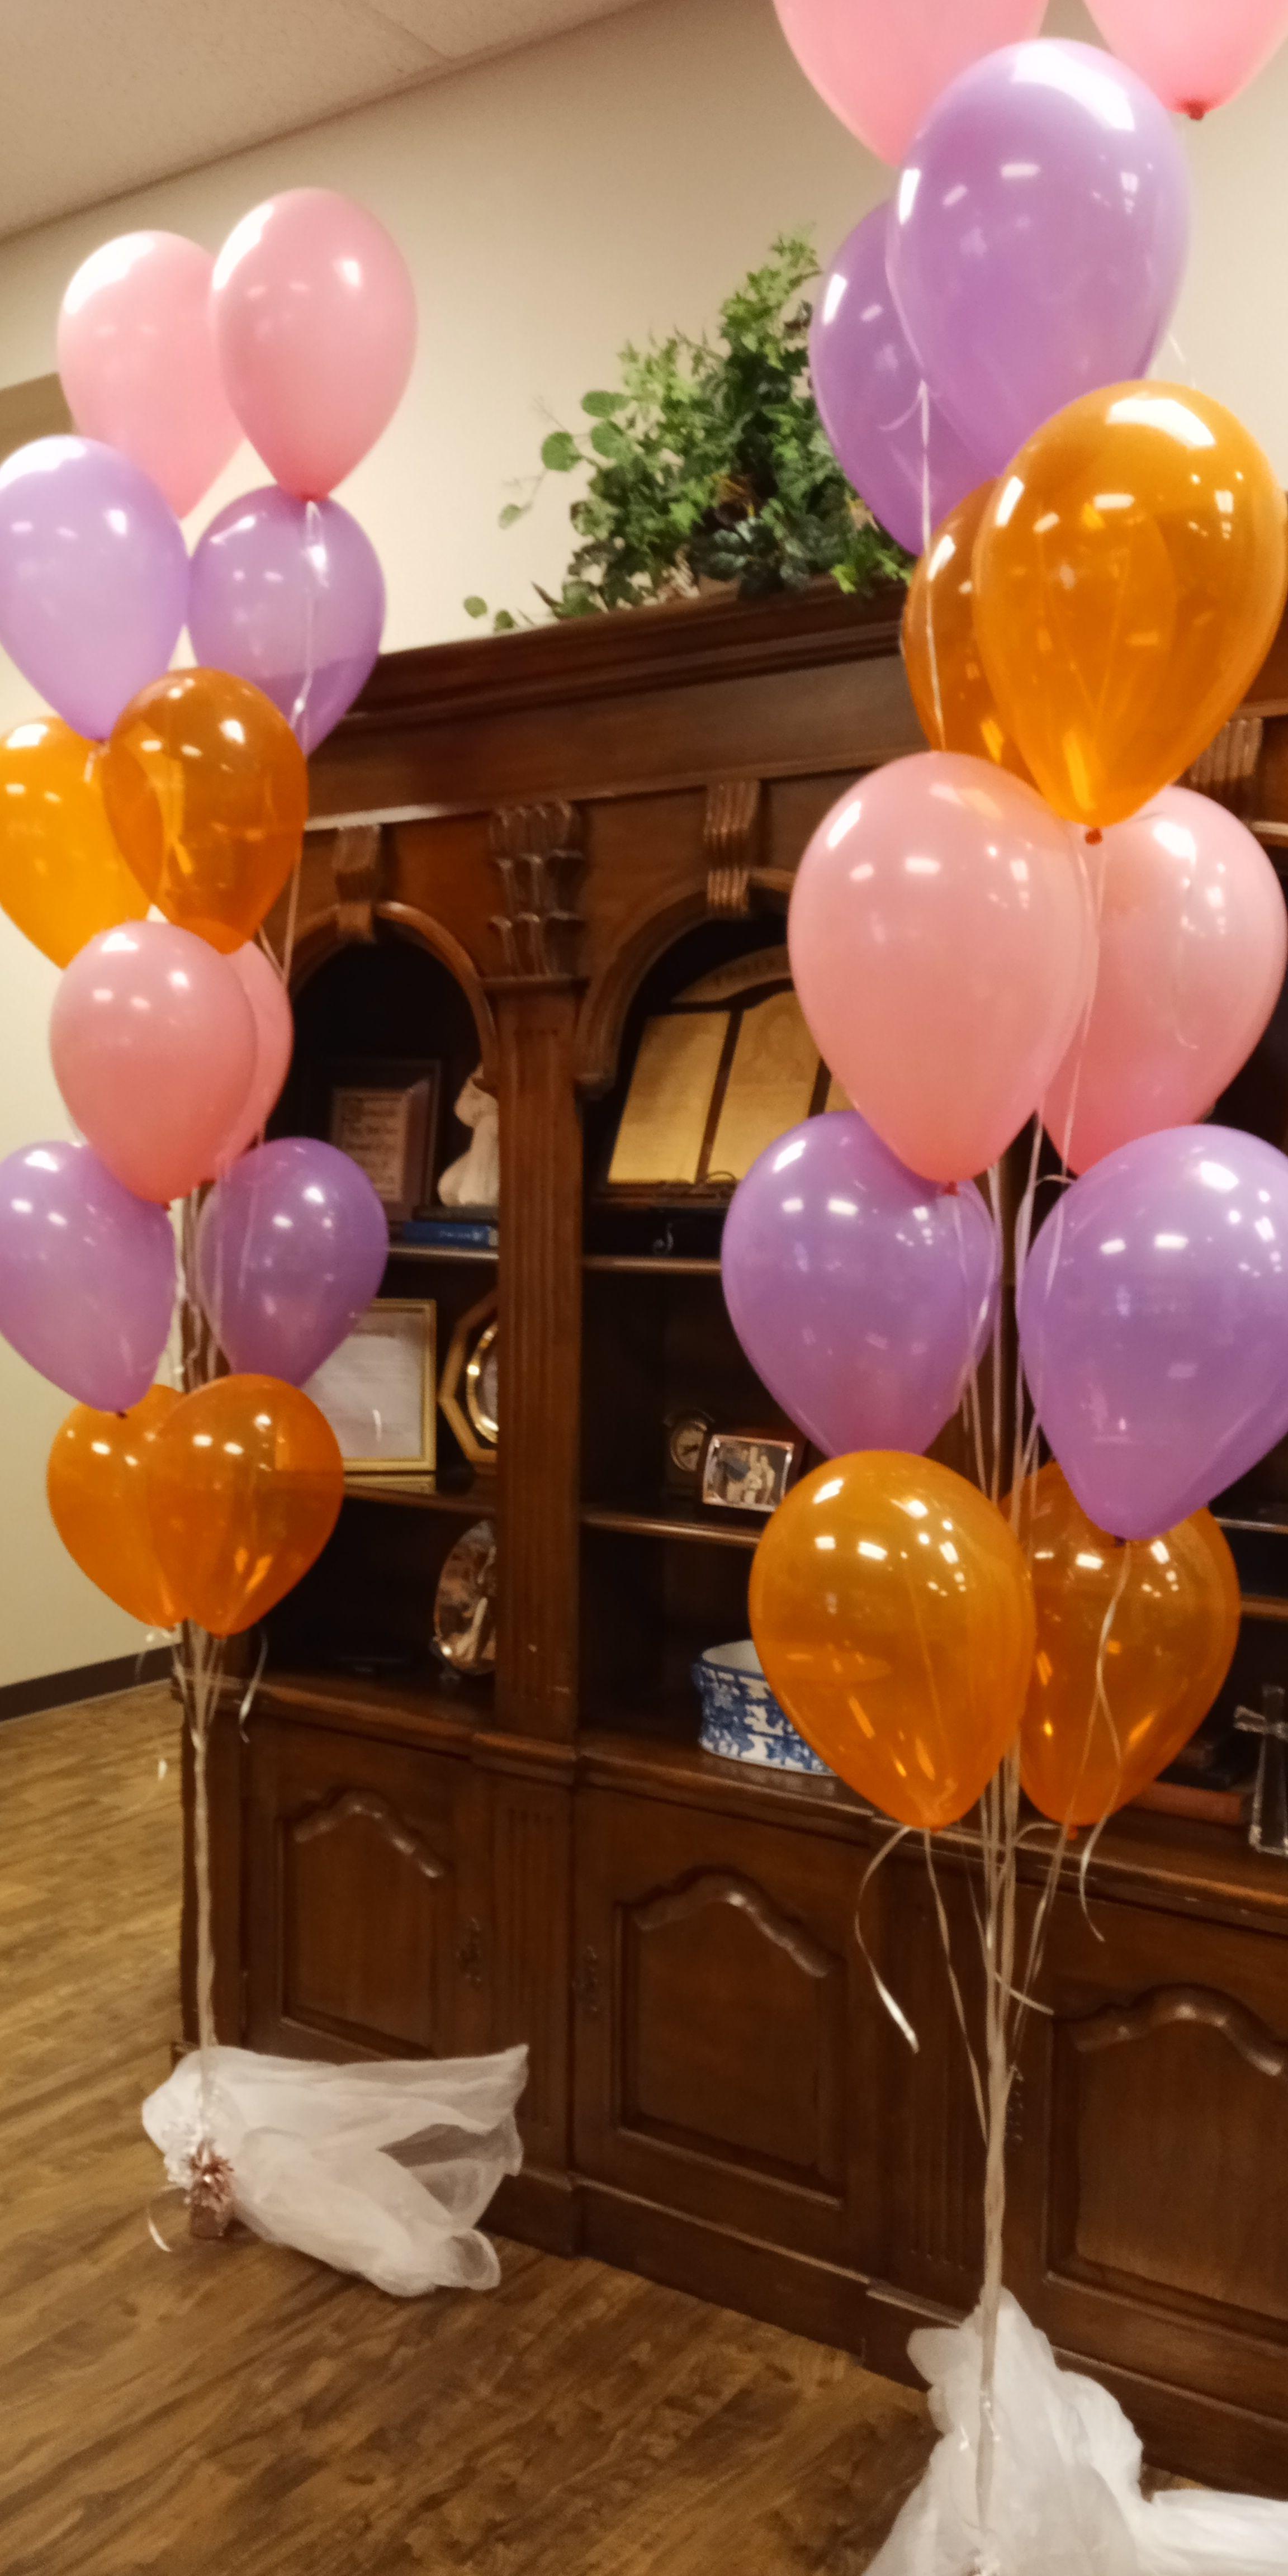 heravi party equipment rental service